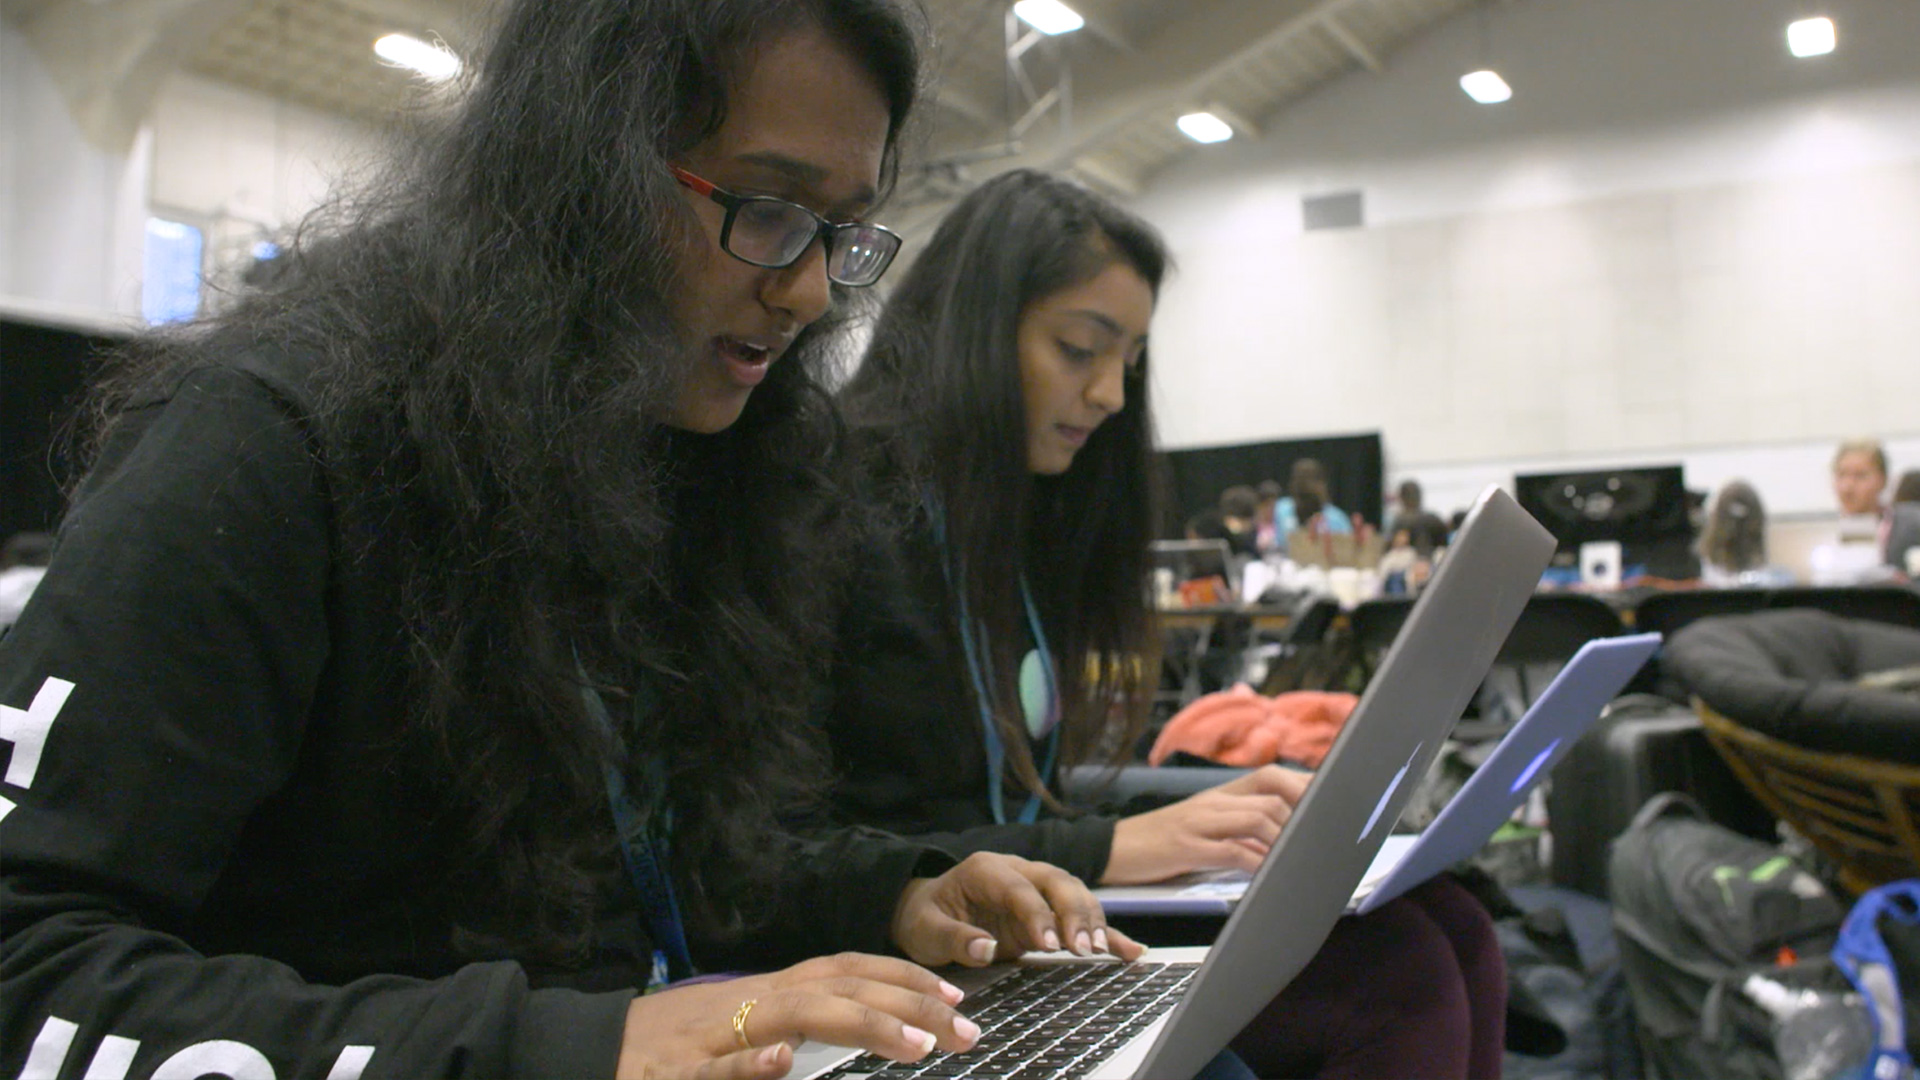 UMD's Technica Hackathon Brings Down Barriers for Women in STEM